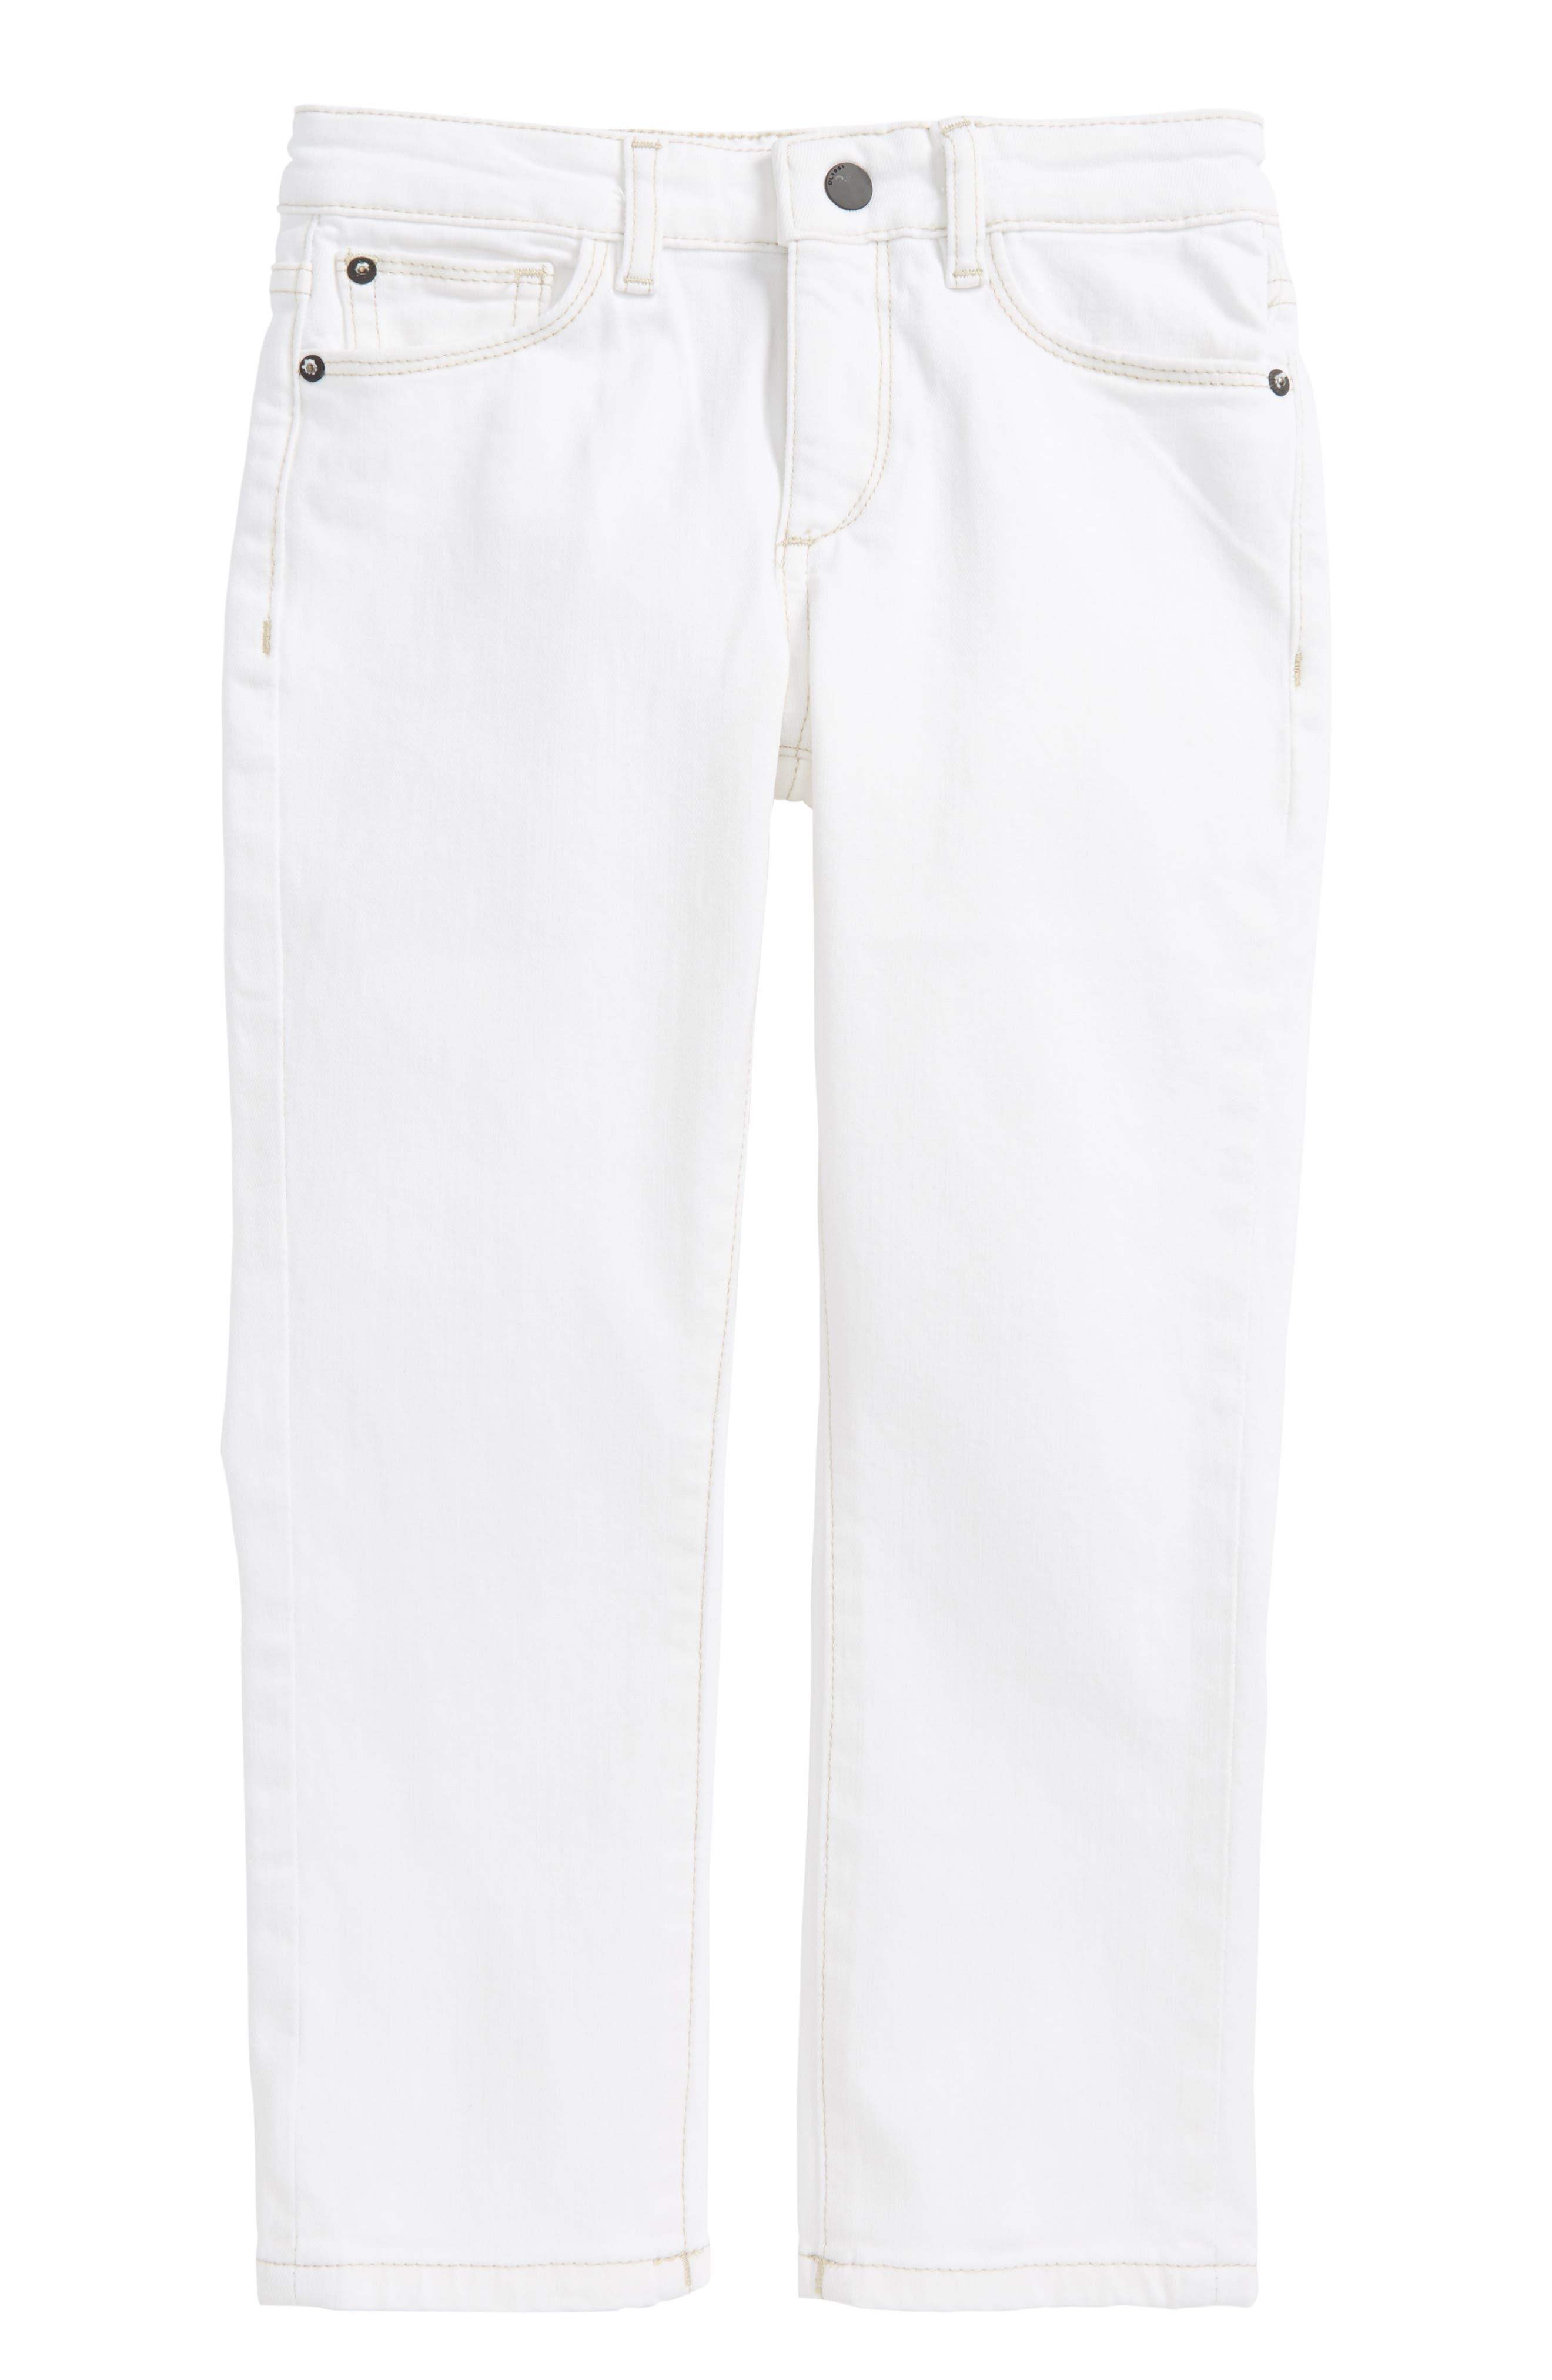 Brady Slim Fit Straight Leg Jeans,                         Main,                         color, 100